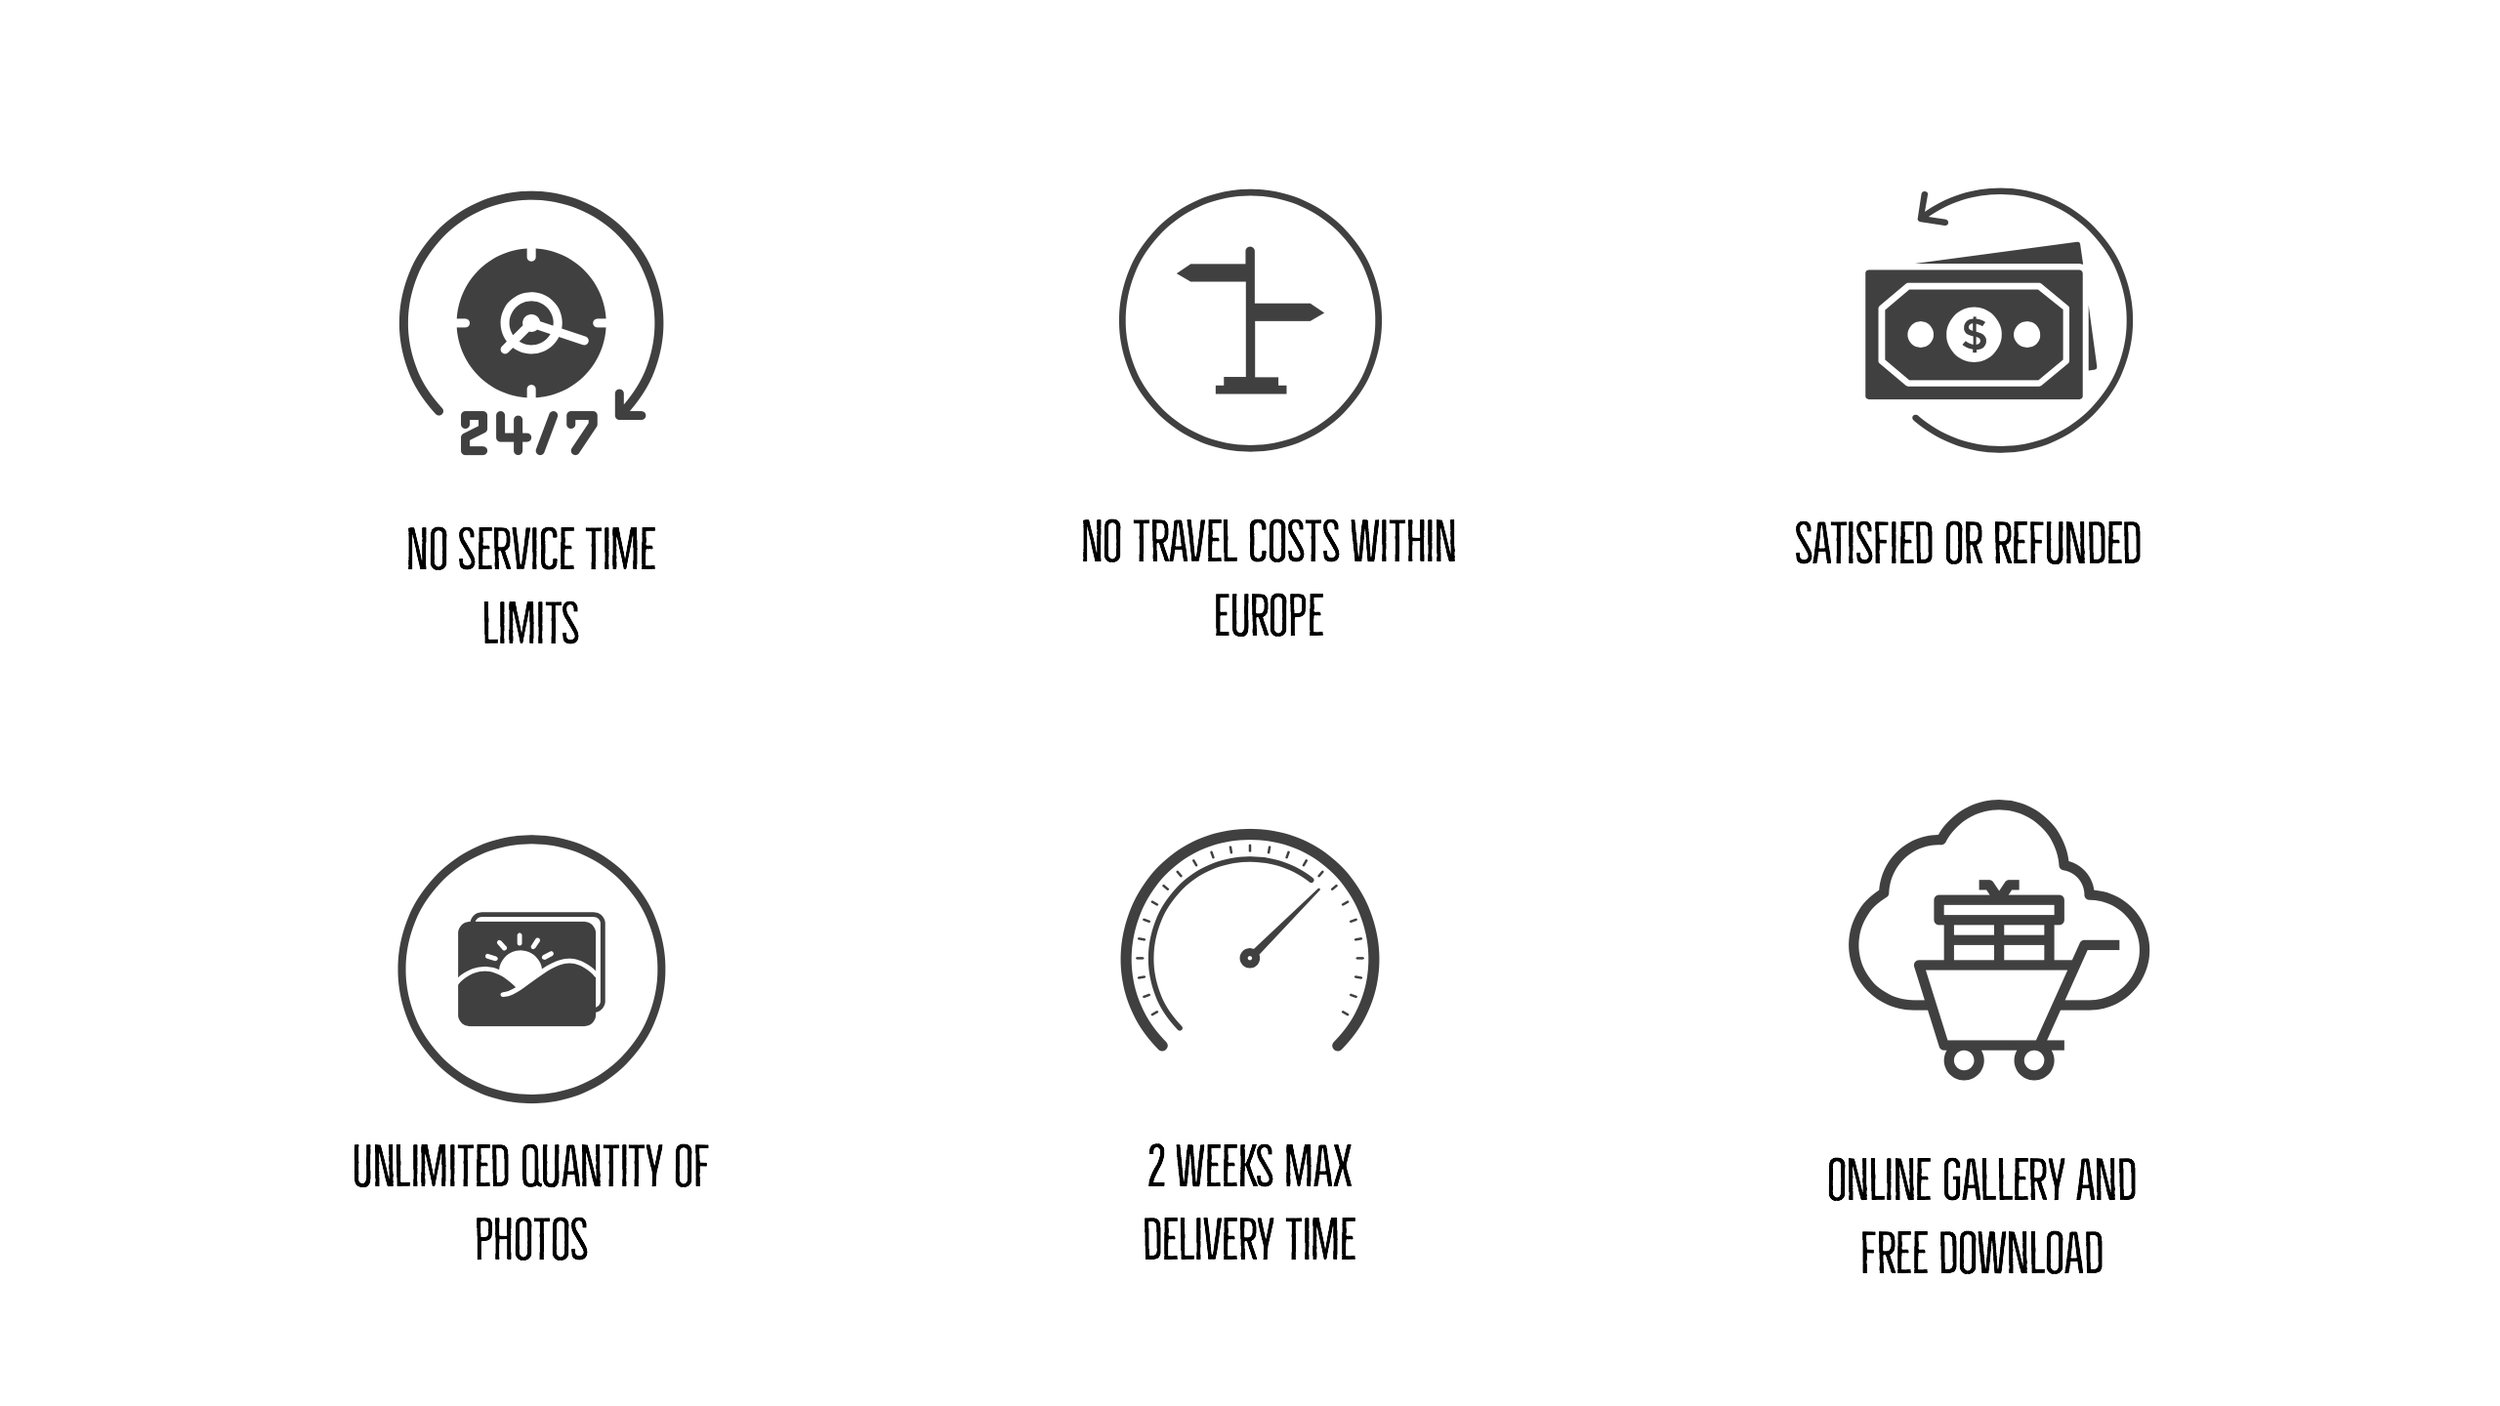 offer-kaikalinin-icons-eng.jpg